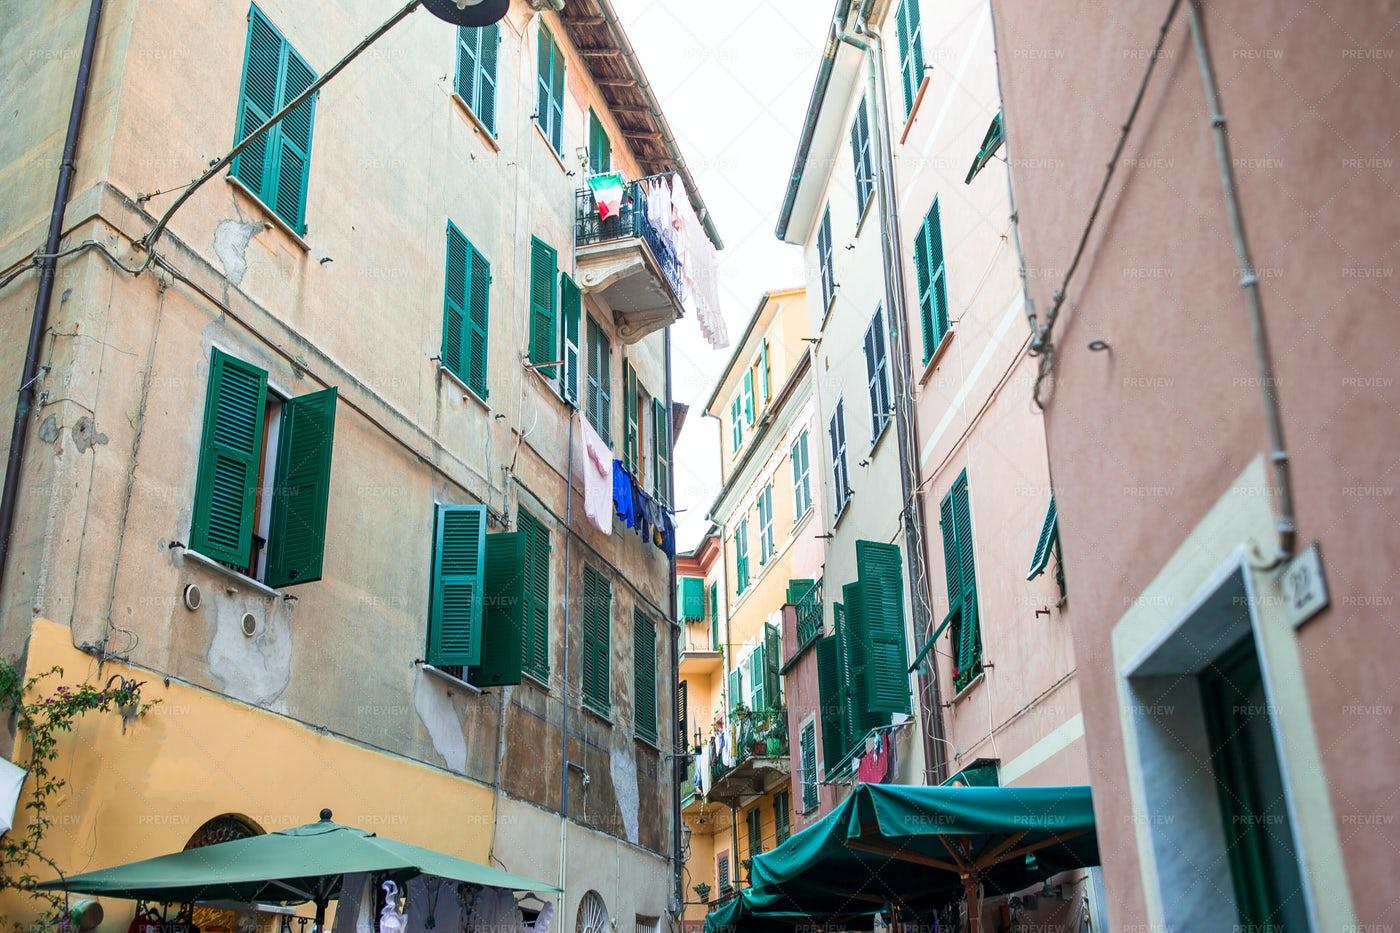 Green Shutters On Italian Buildings: Stock Photos